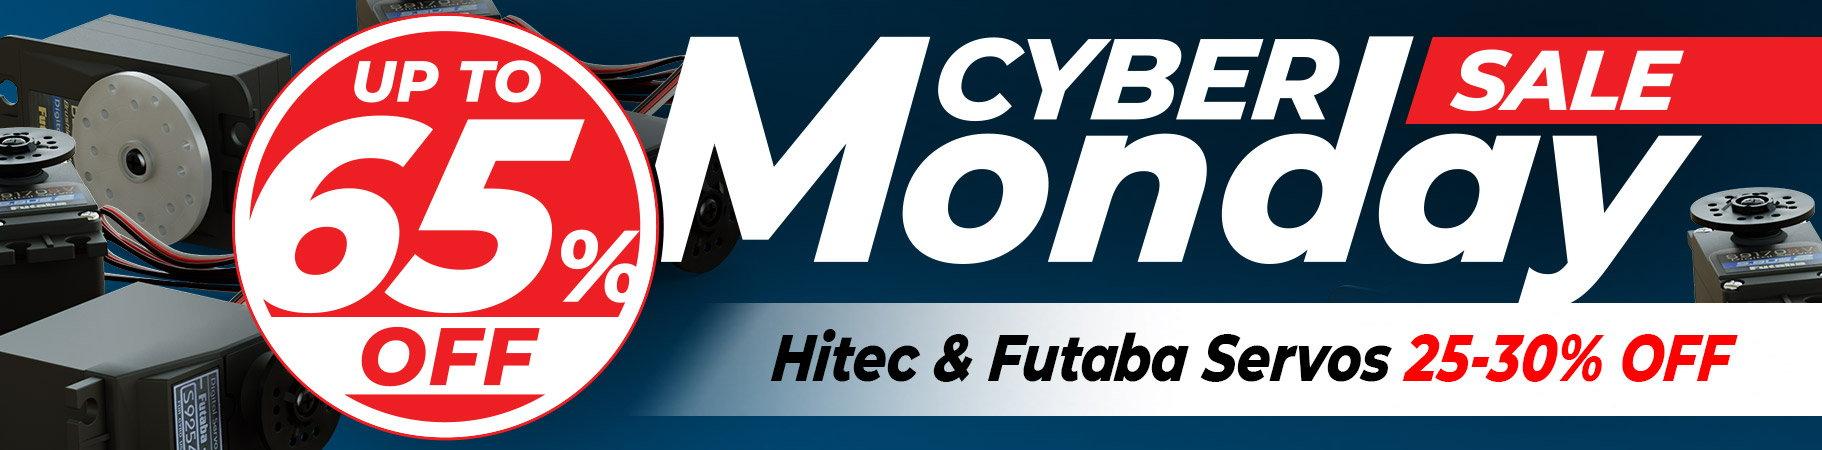 cybermondaysale_futaba_1822x450_06e4d7b2da99594b2c5b61553f17a3e0910dd7a3.jpg